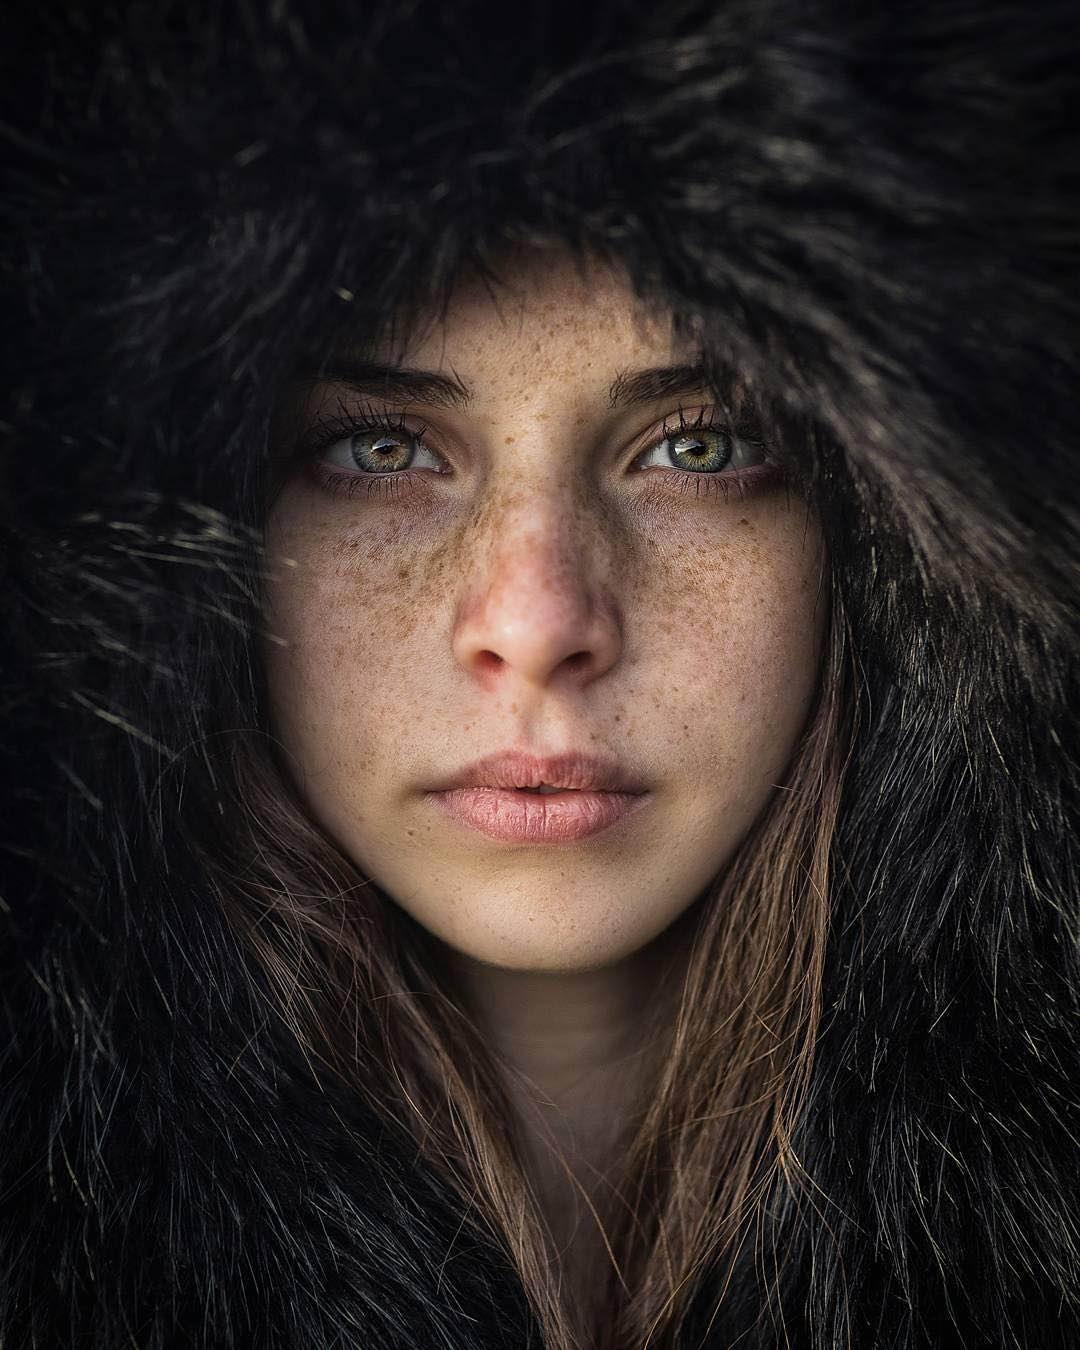 Пятничные девушки на Pixmafia.com